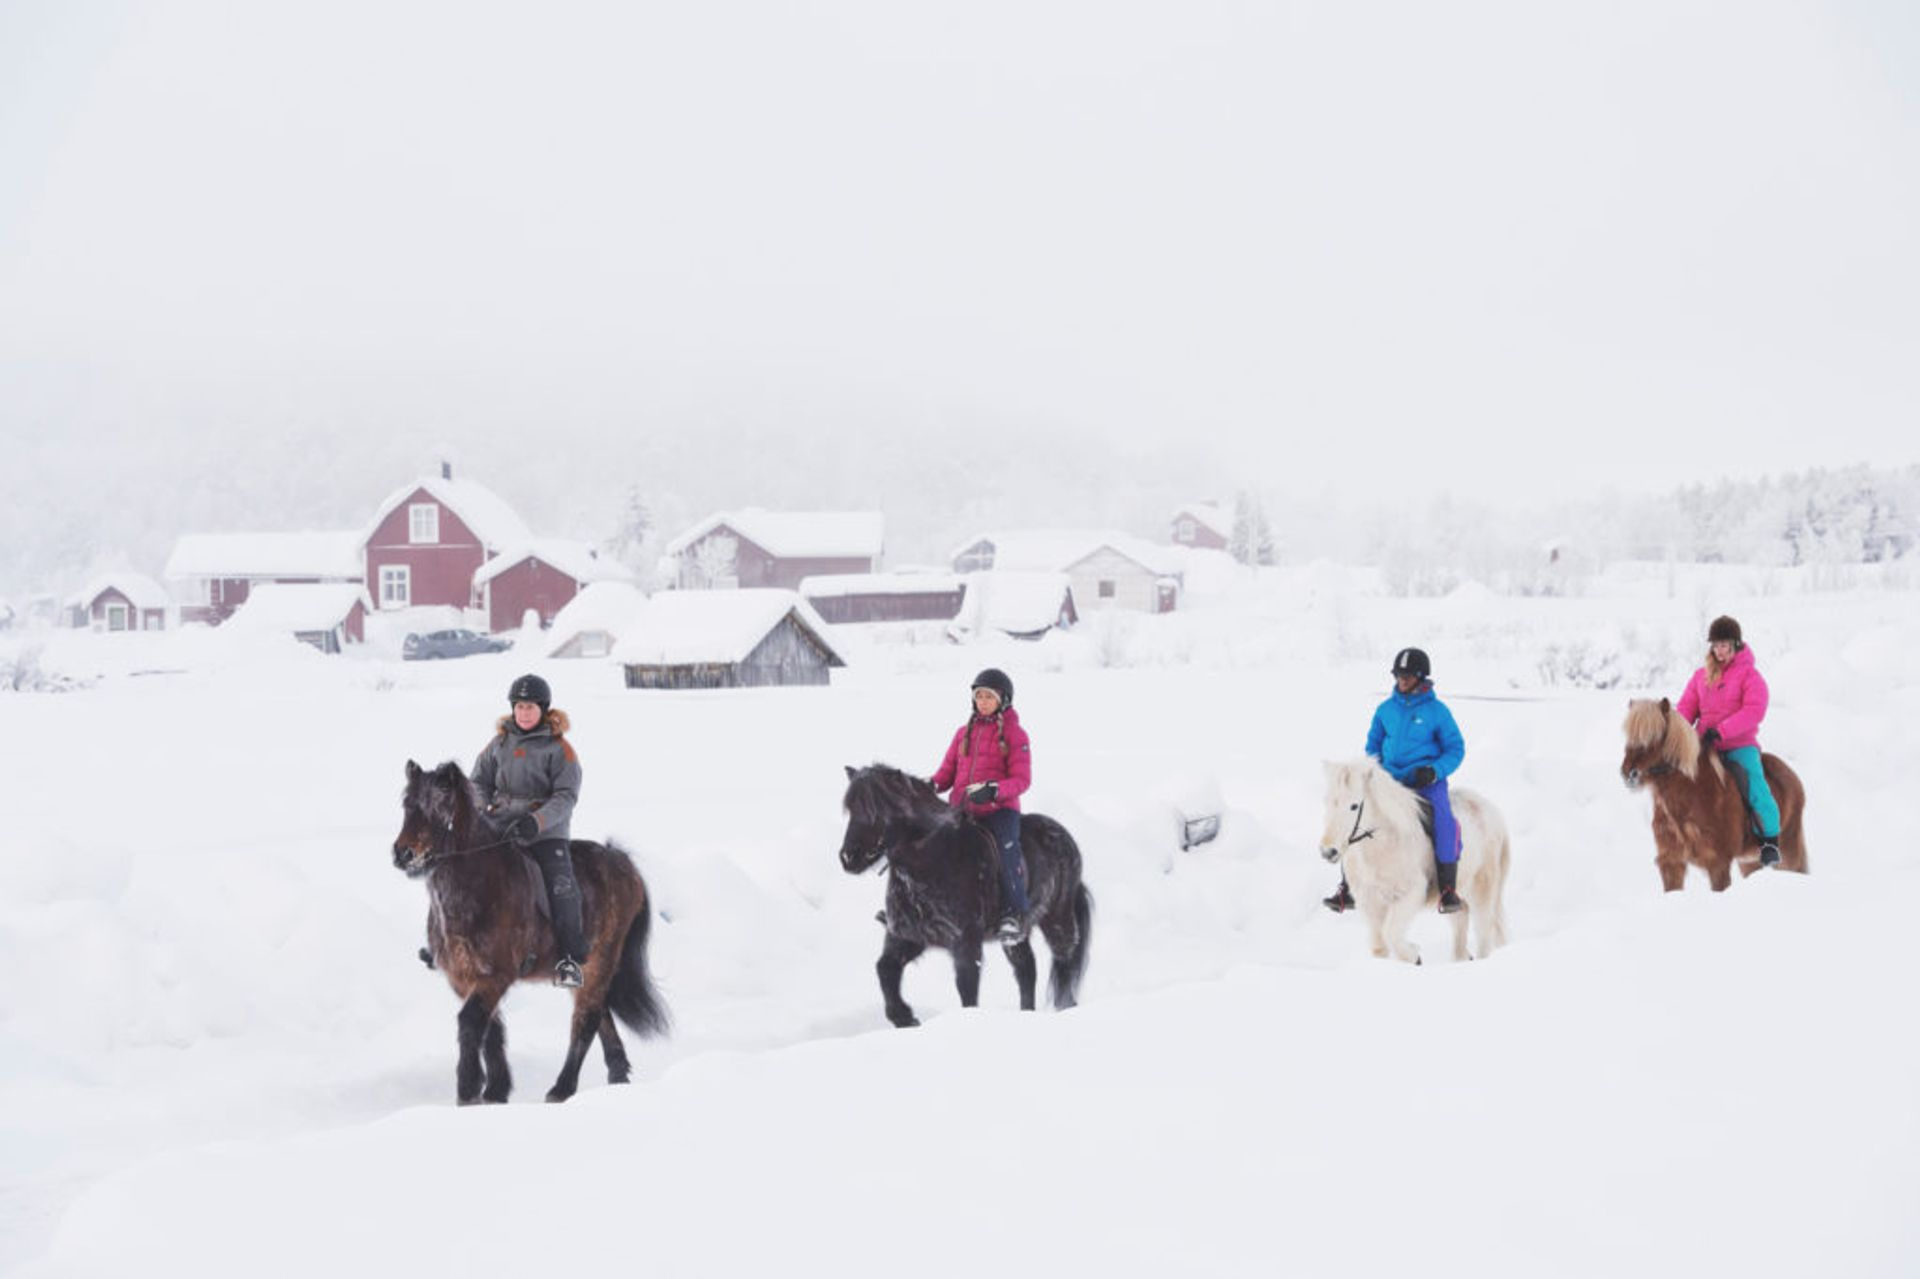 Horseback riding during winter.